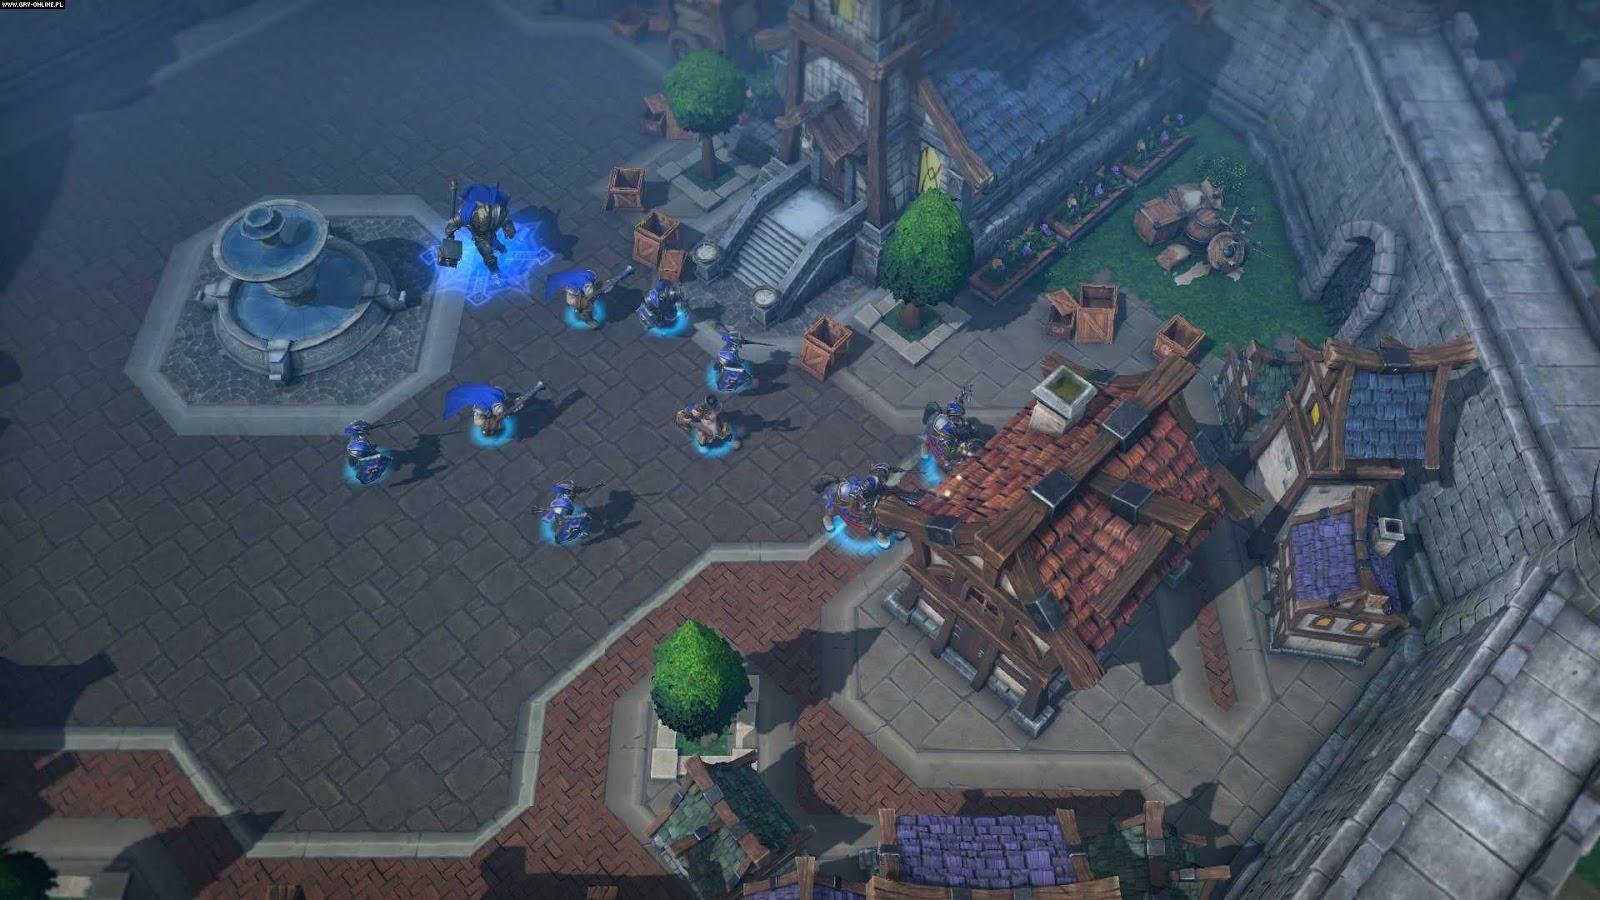 Tải về Warcraft 3 Reforged full crack Google Drive - Daominhha.com